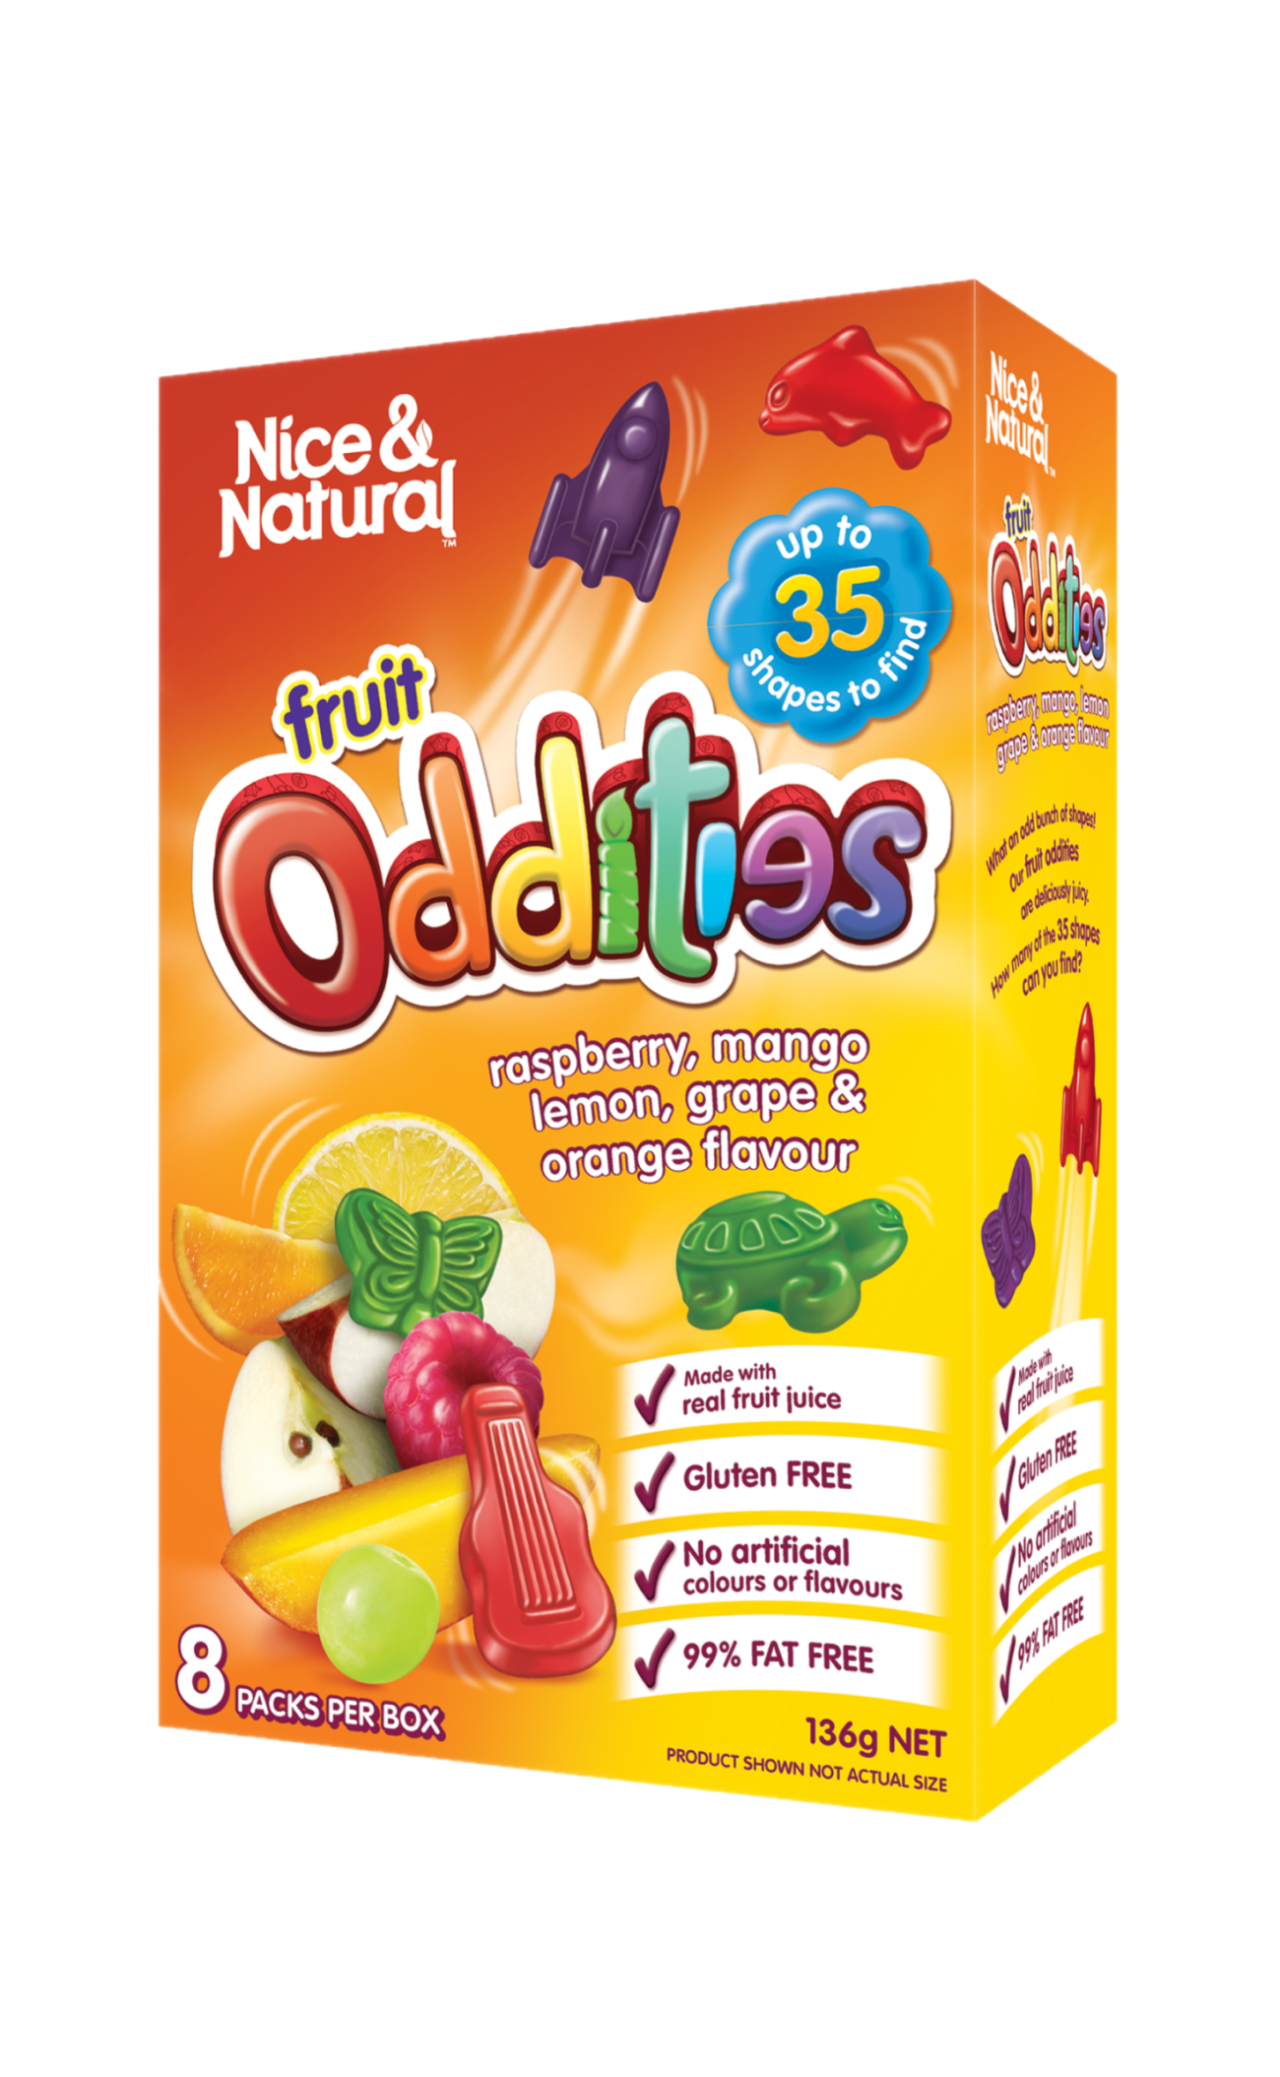 Fruit Oddities product image